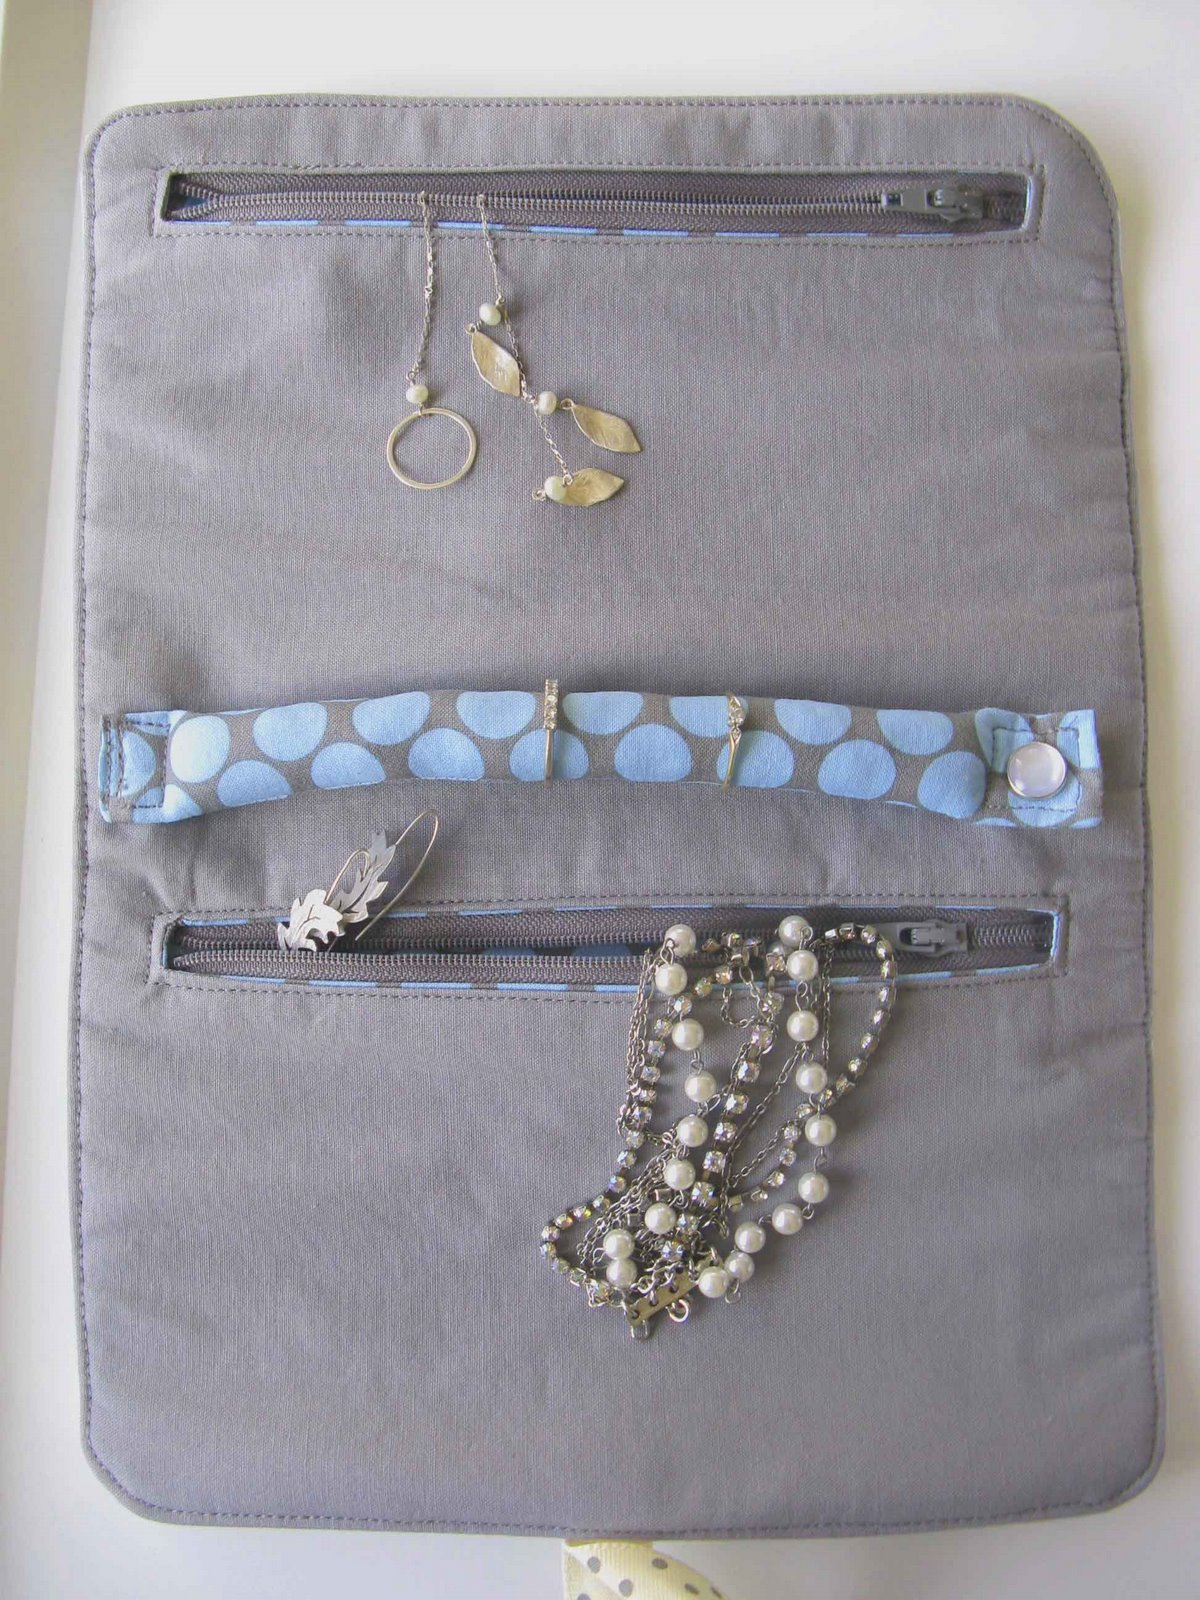 Travel Jewelry Roll Case Tutorial